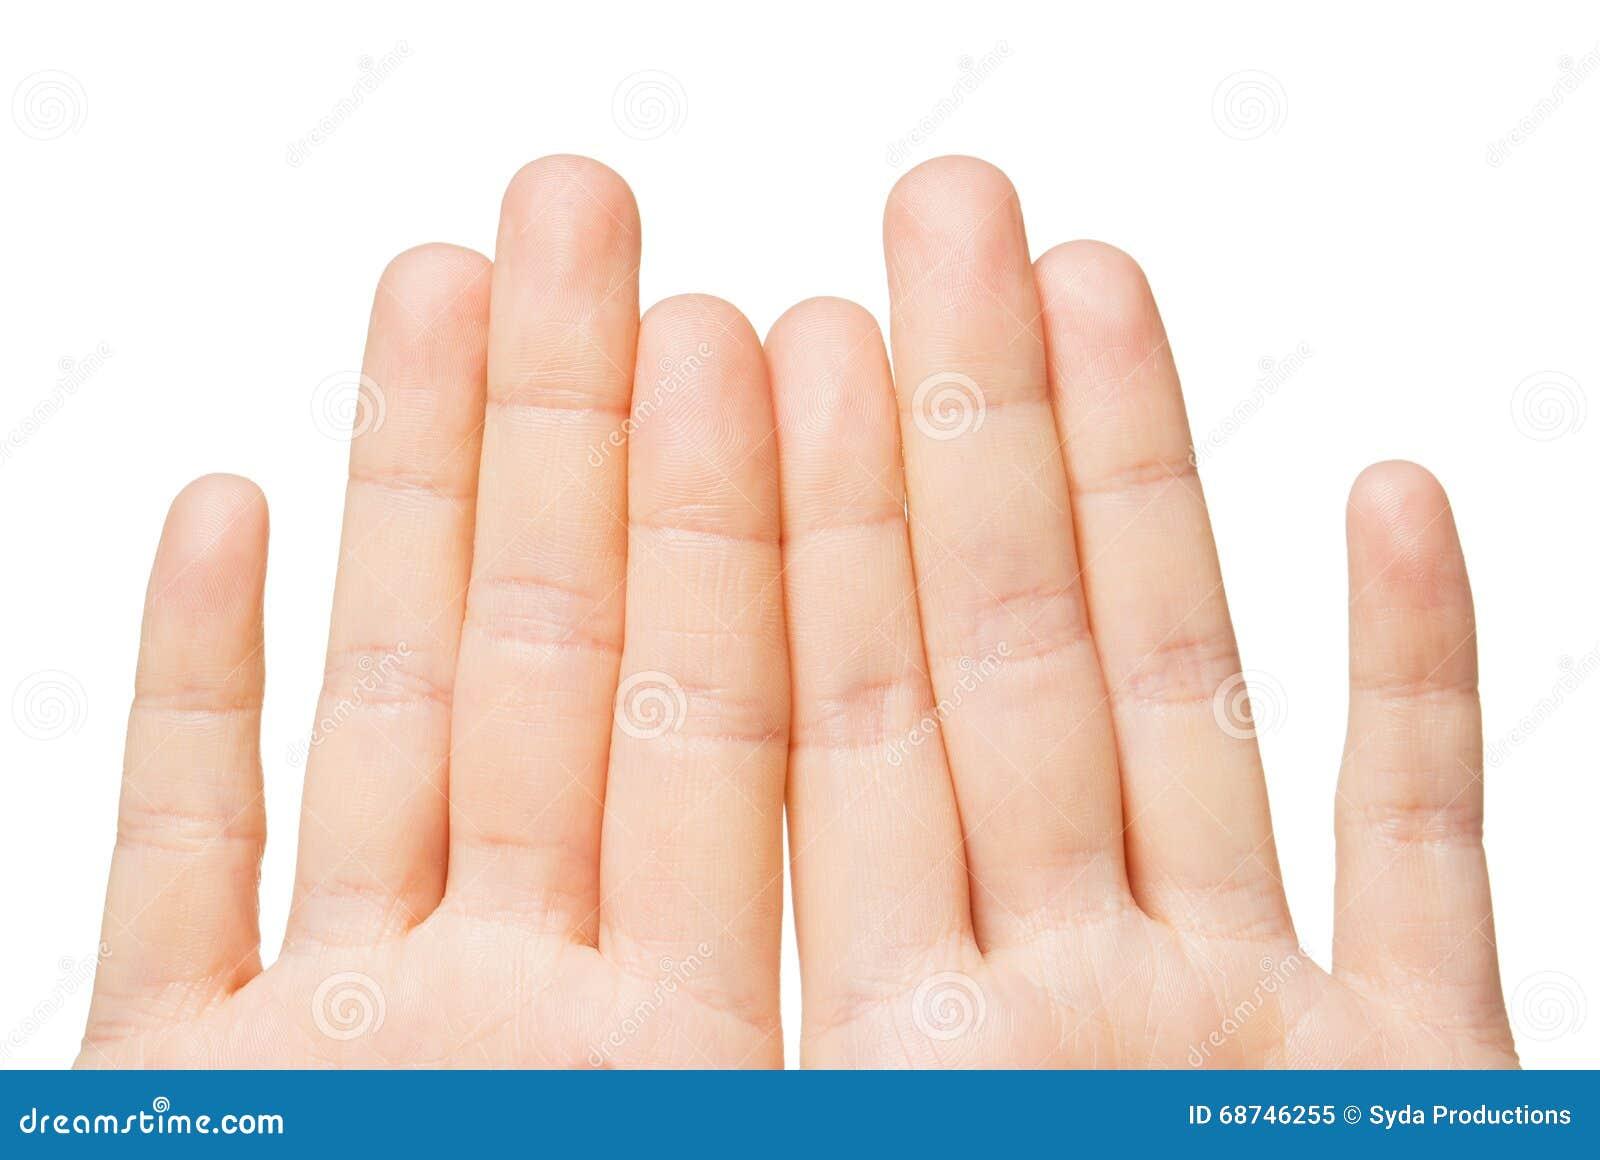 Close up fingering videos